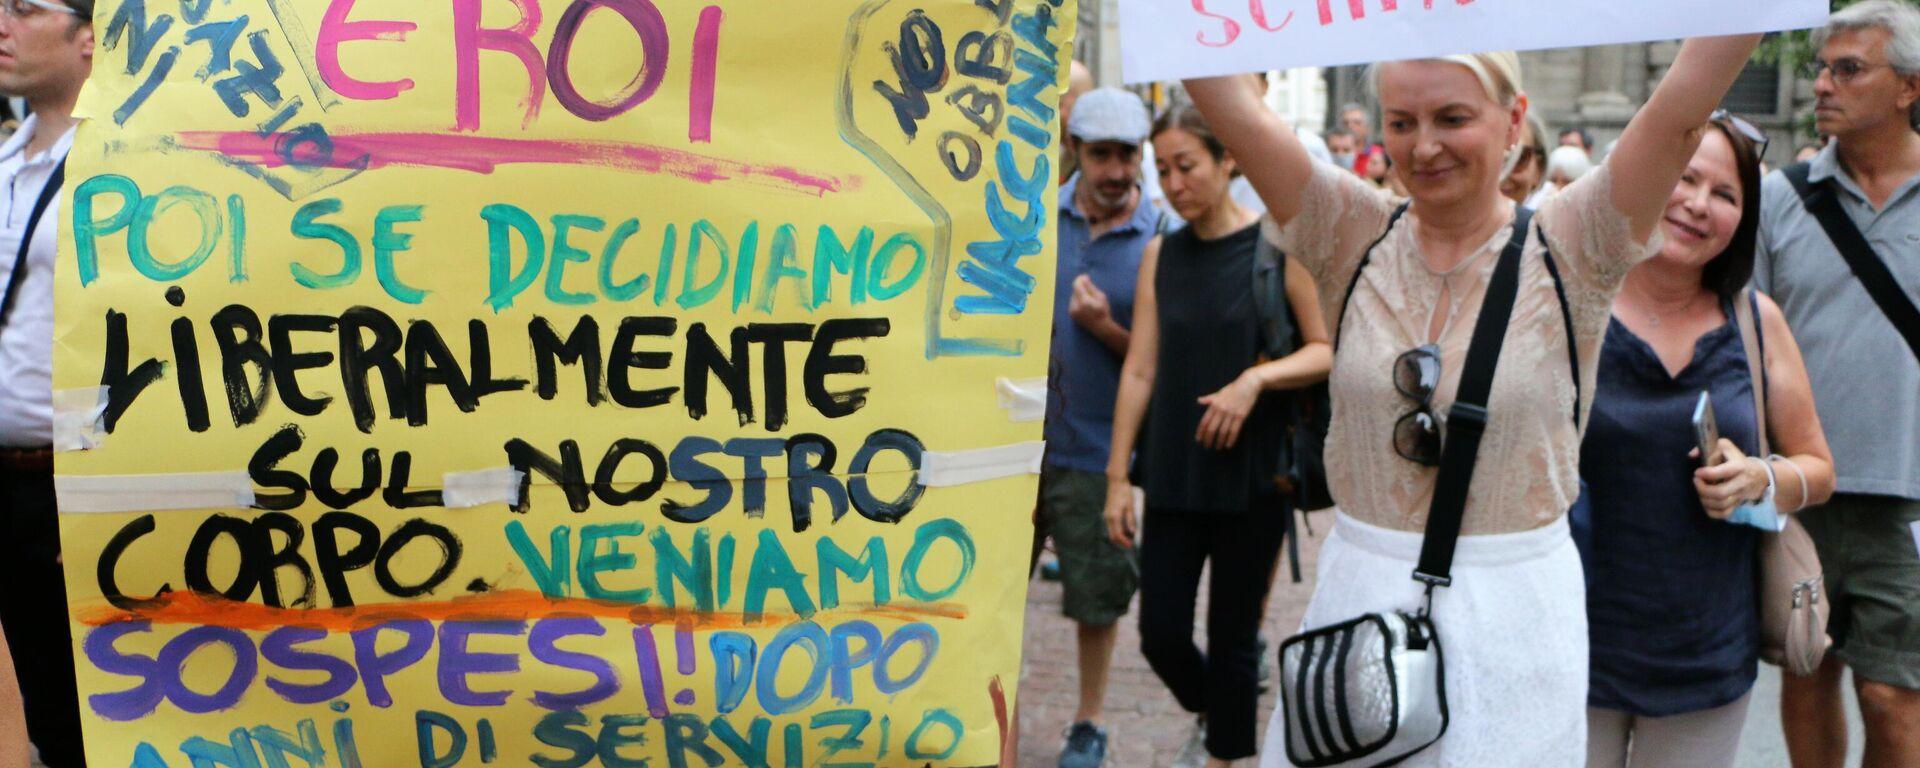 Manifestazione No Green Pass, Milano 31.07 - Sputnik Italia, 1920, 02.08.2021